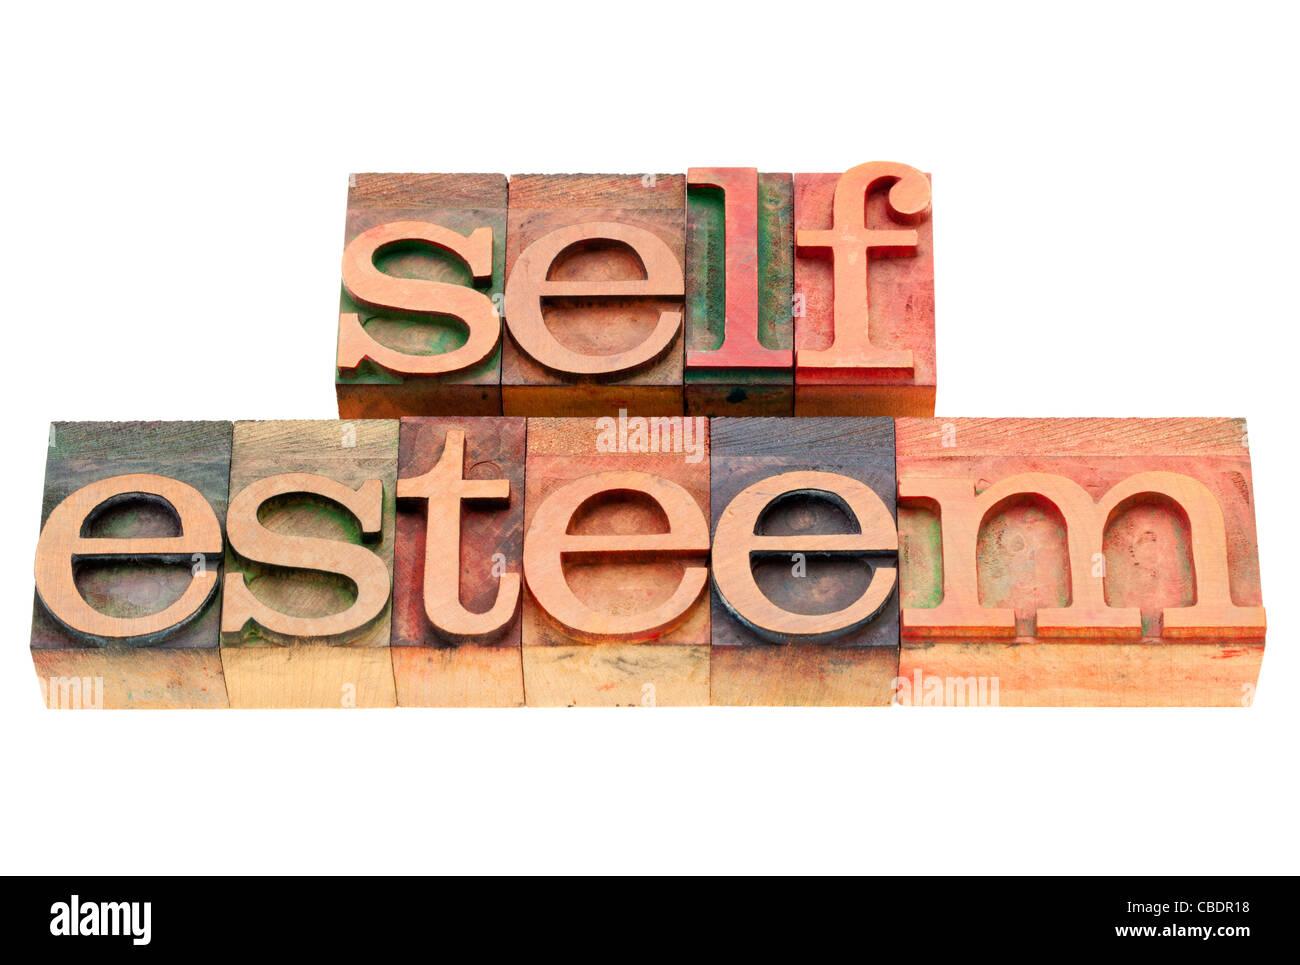 self esteem - isolated text in vintage wood letterpress printing blocks - Stock Image